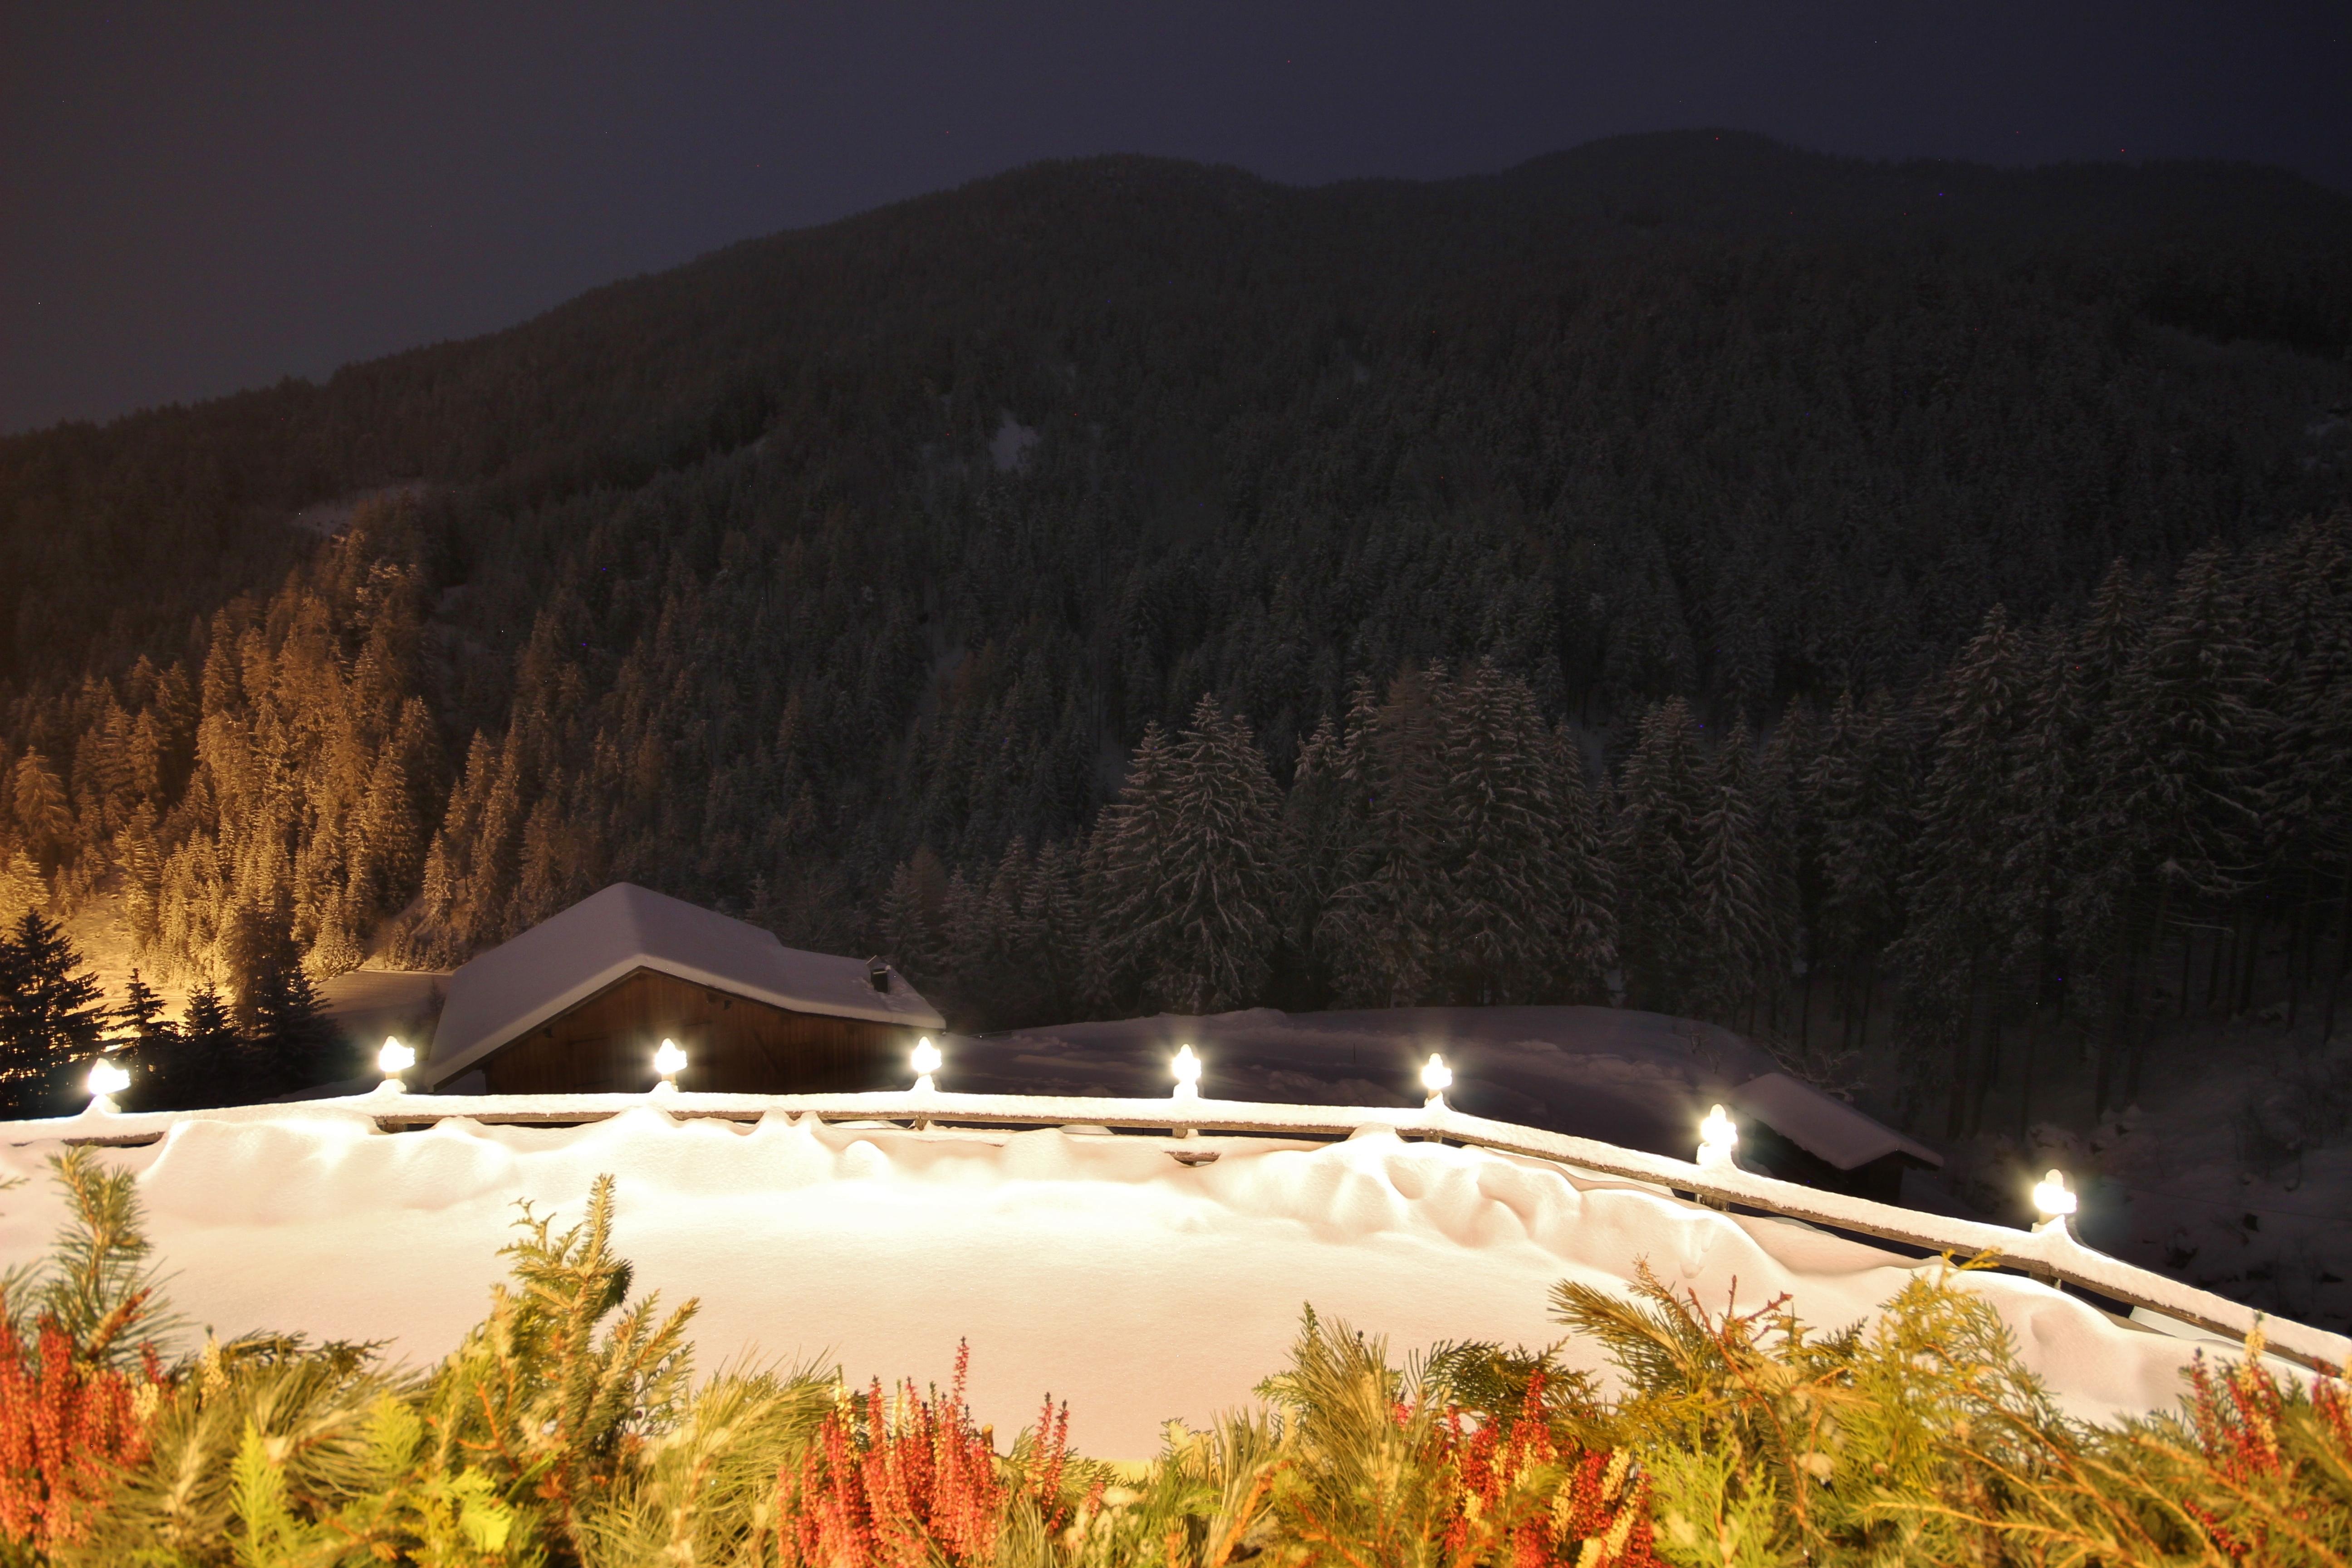 Dolomitenblick Balkon Winter 2020